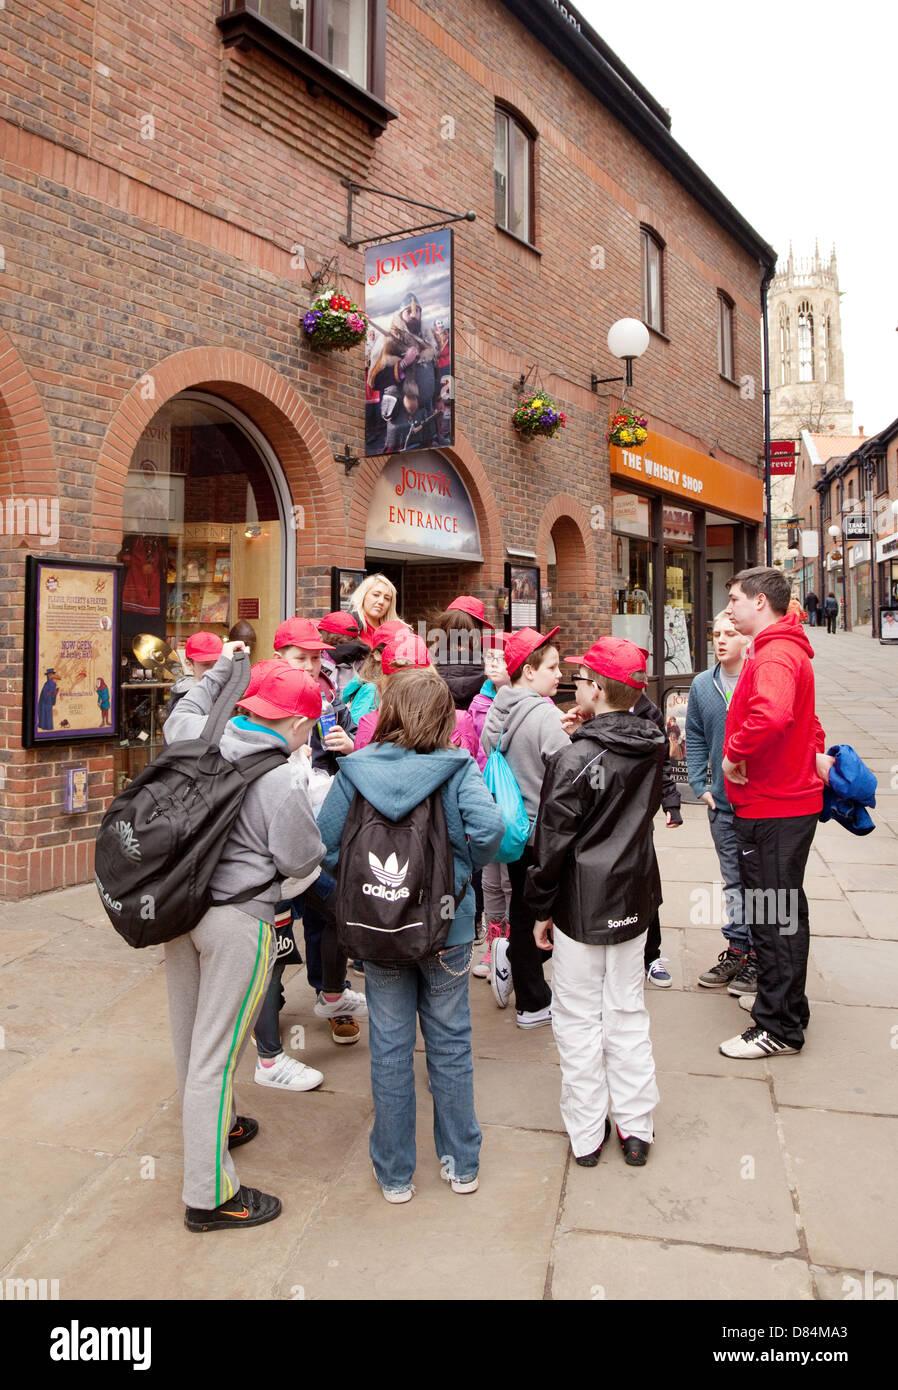 School children on a school trip waiting to enter the Jorvik Viking Centre, York, yorkshire, UK - Stock Image